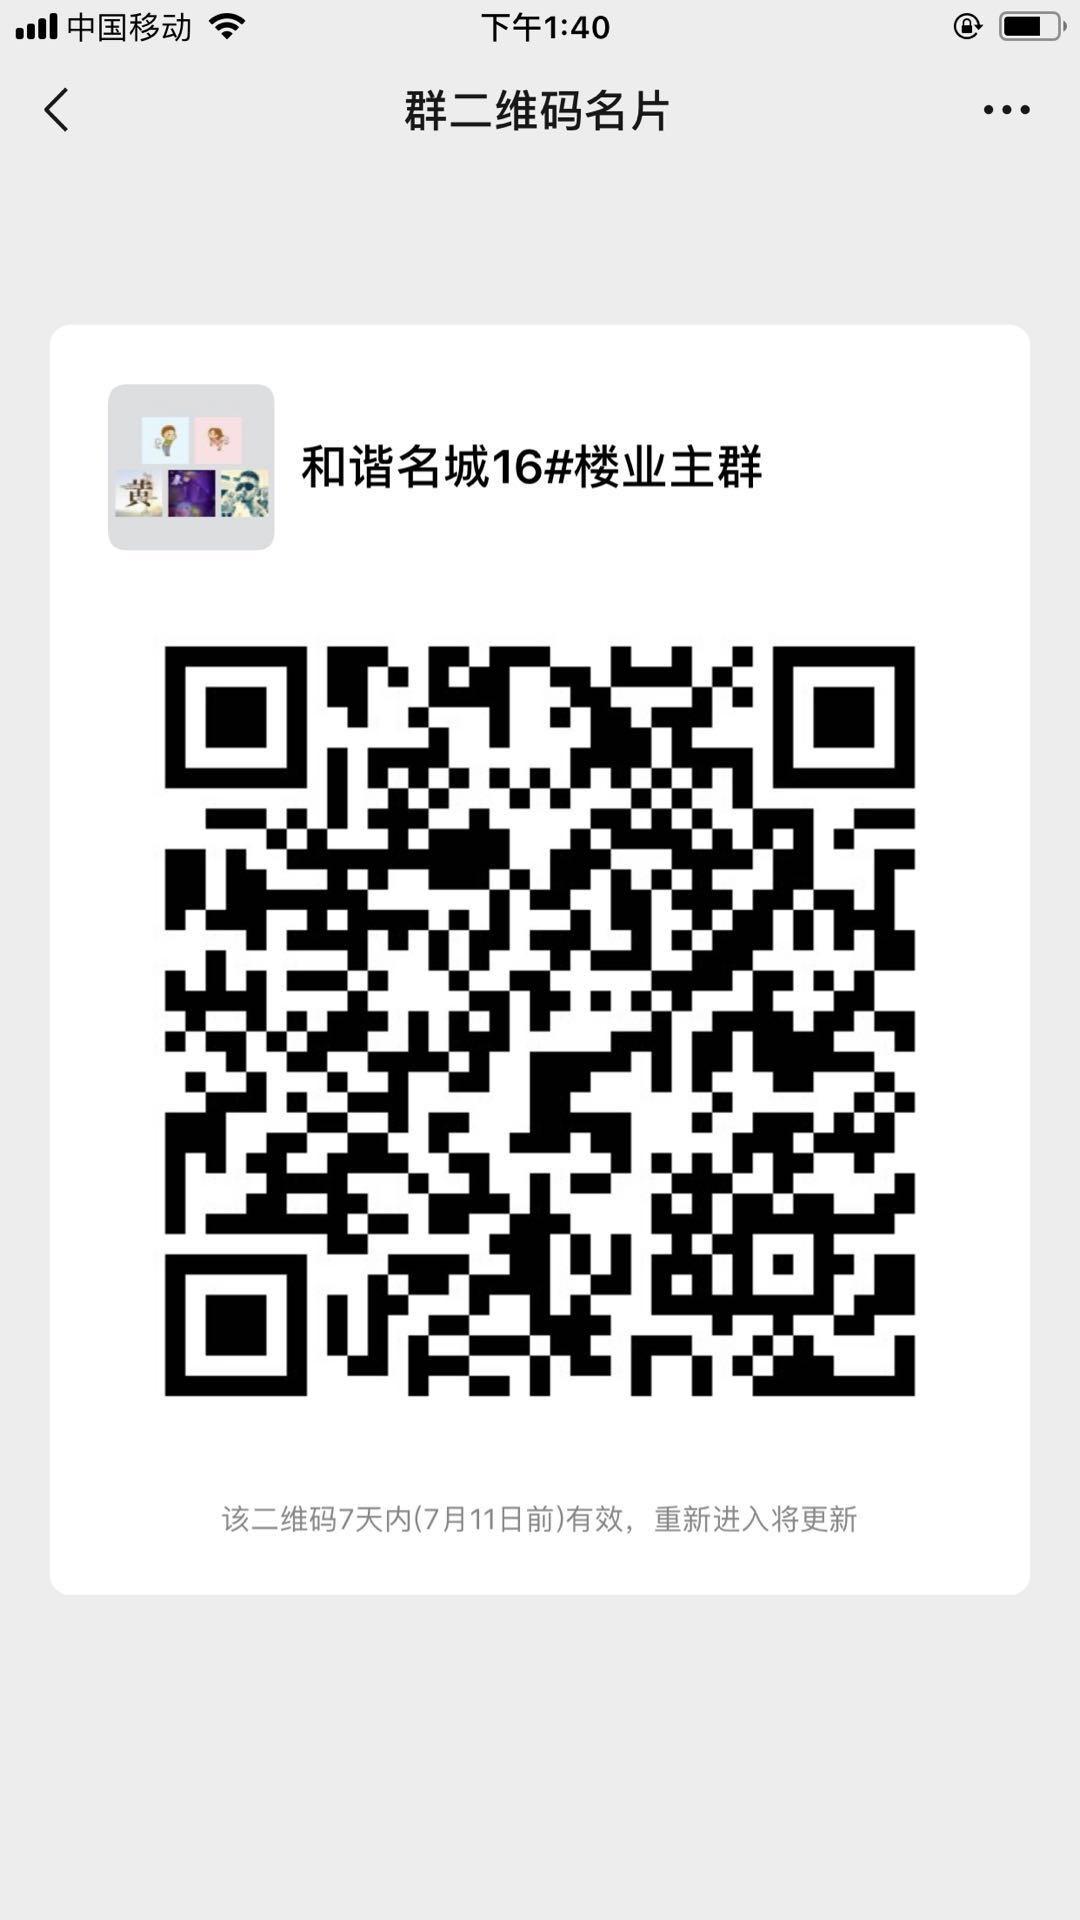 fba447b356f8abd4659fb0f5b8a07b1.jpg